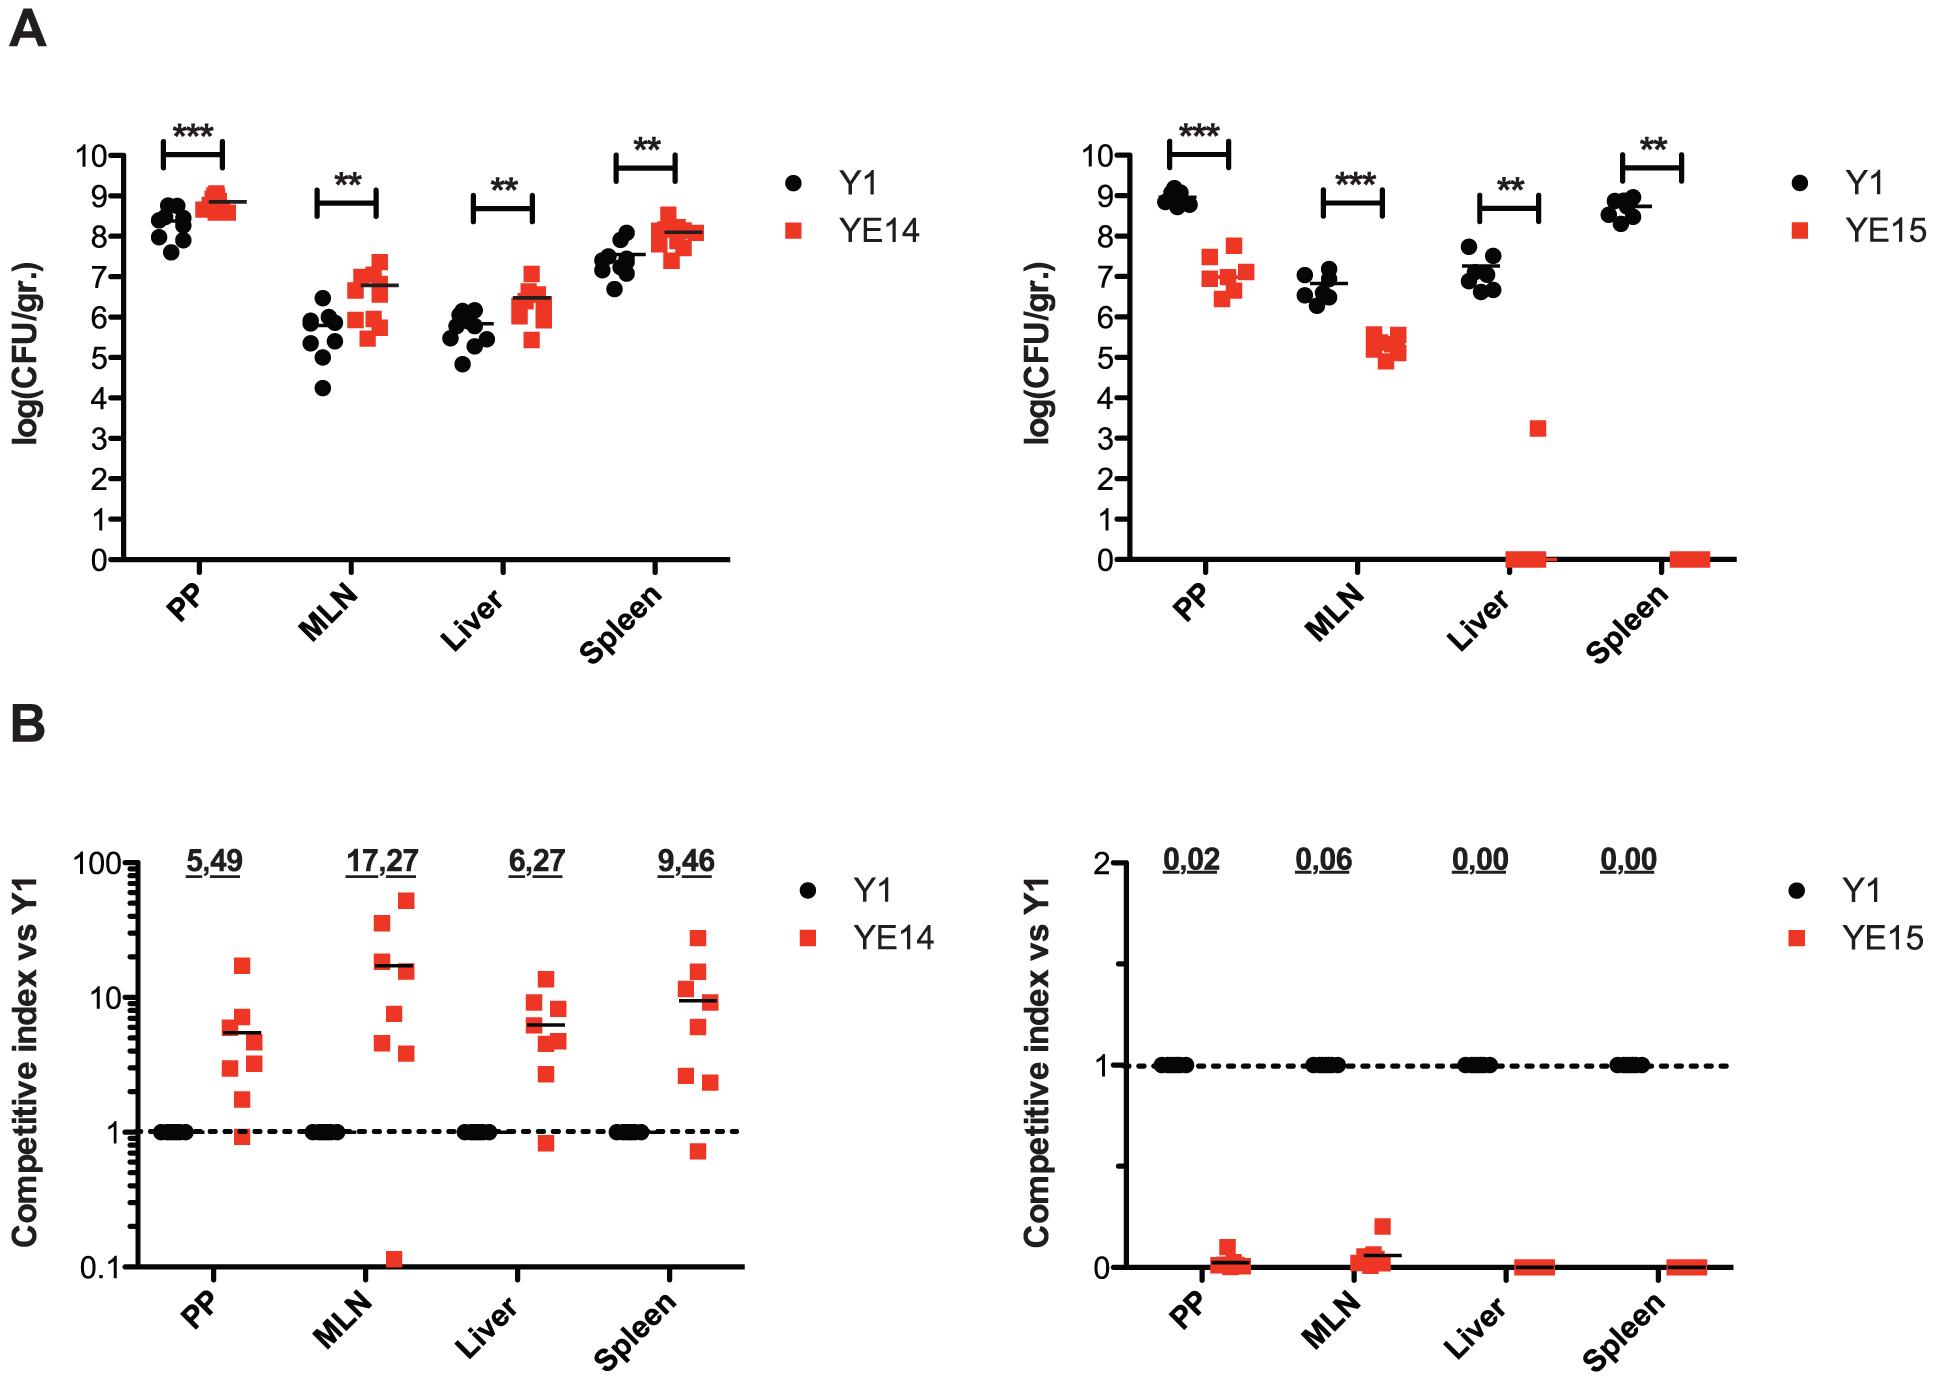 Influence of enhanced invasin and RovA levels on <i>Y. enterocolitica</i> O:3 virulence.